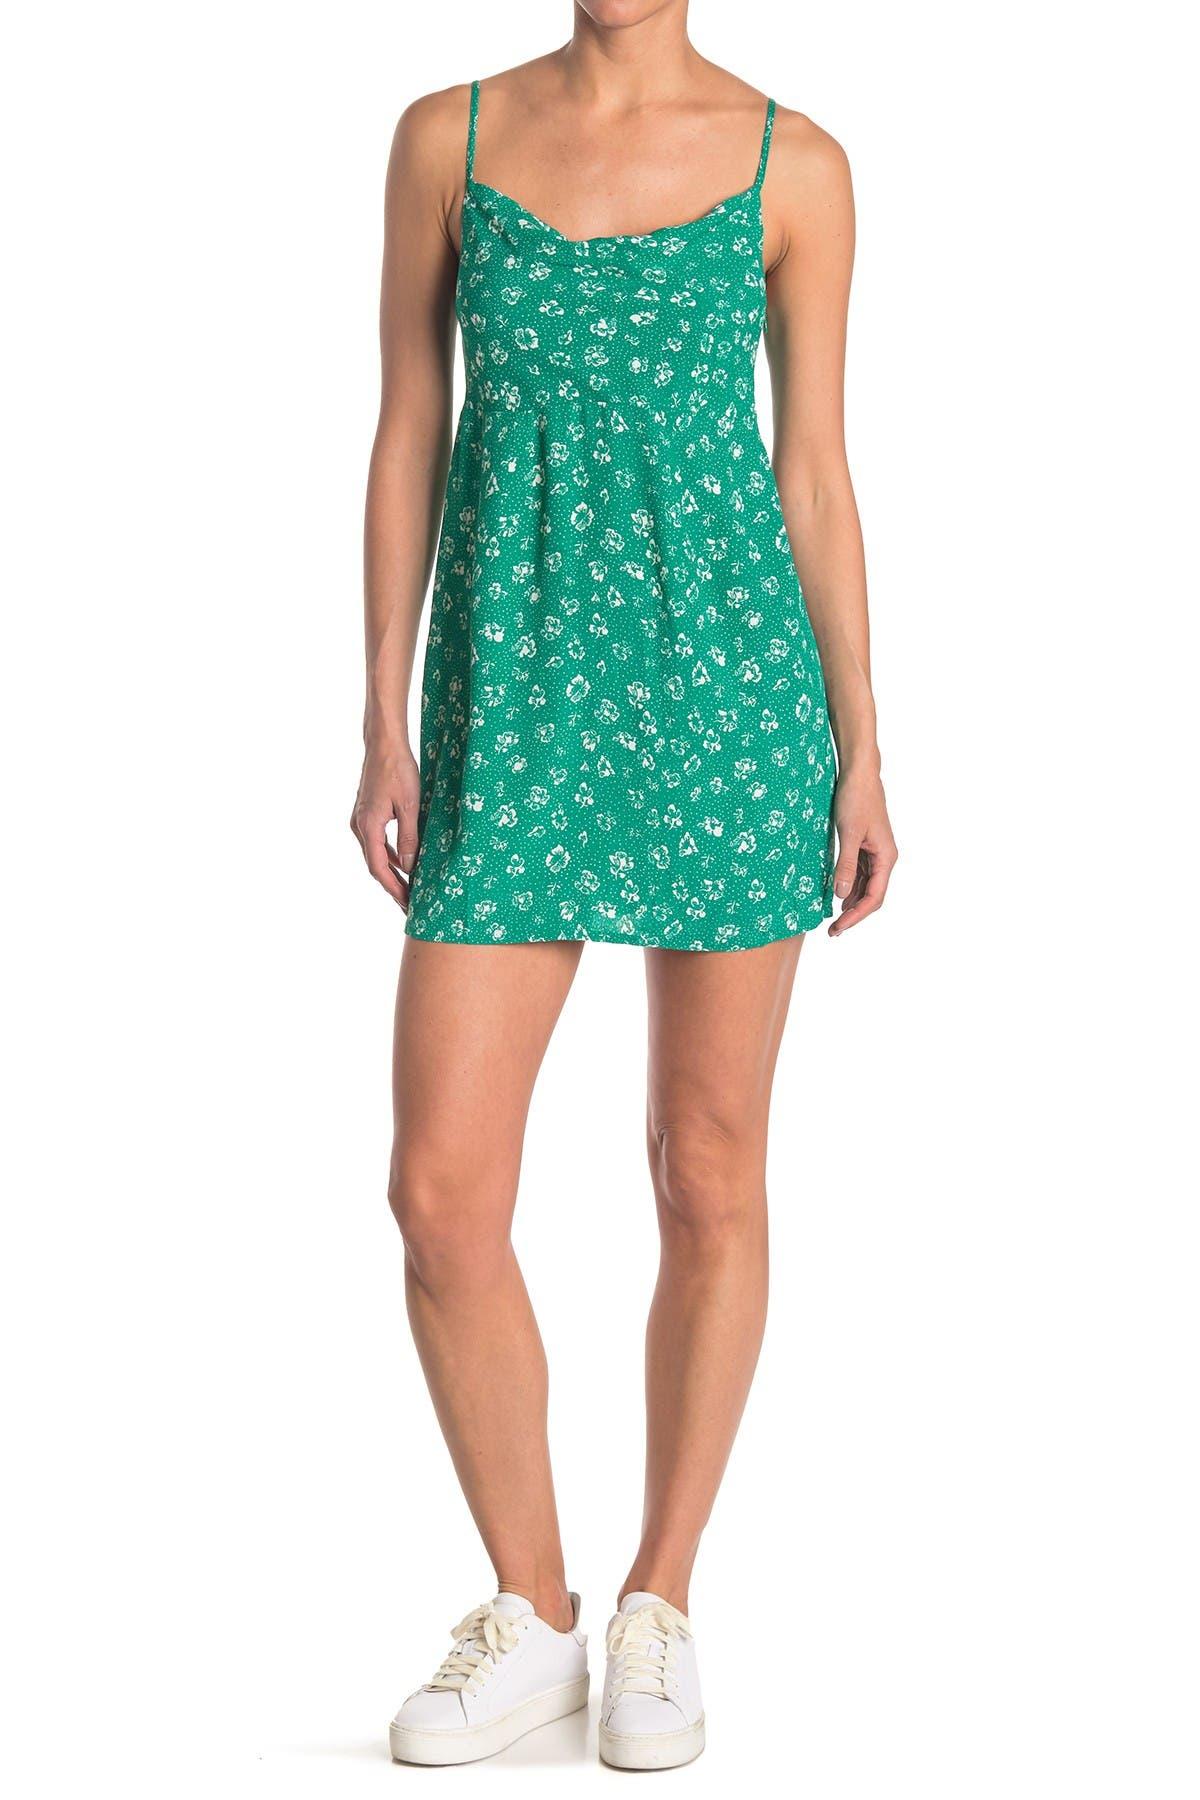 Image of Obey Jade Mini Dress